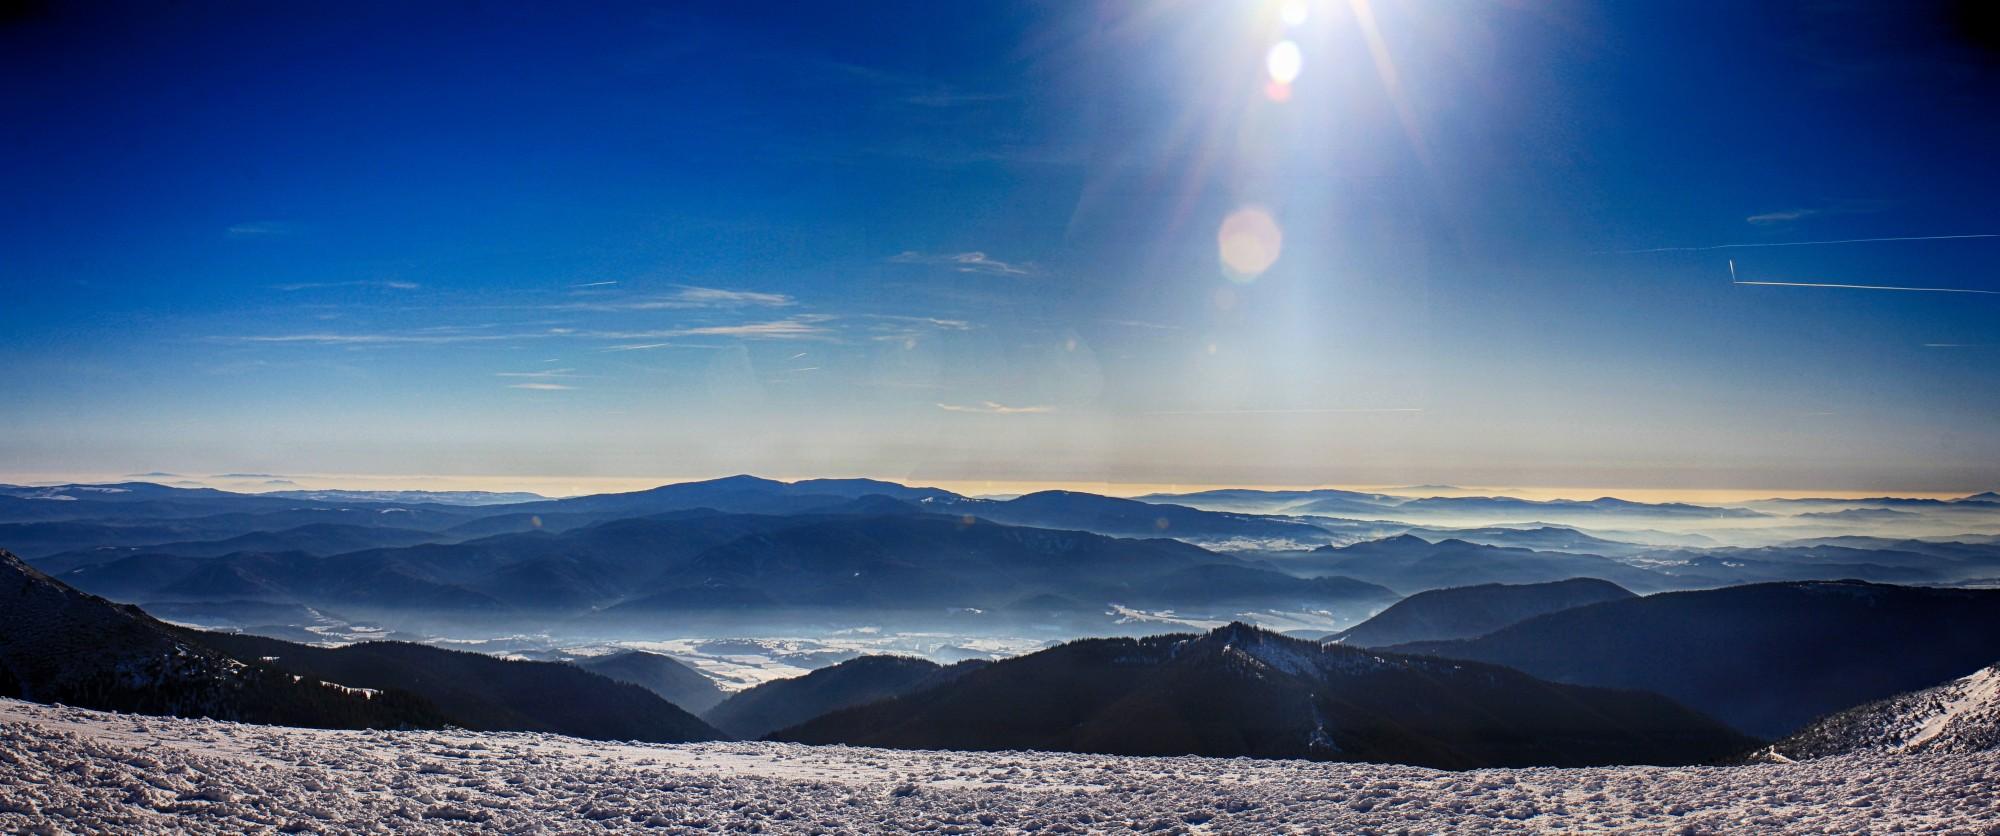 Nízke_Tatry_-_Chabenec_30.12.2016__(125)_panorama.jpg